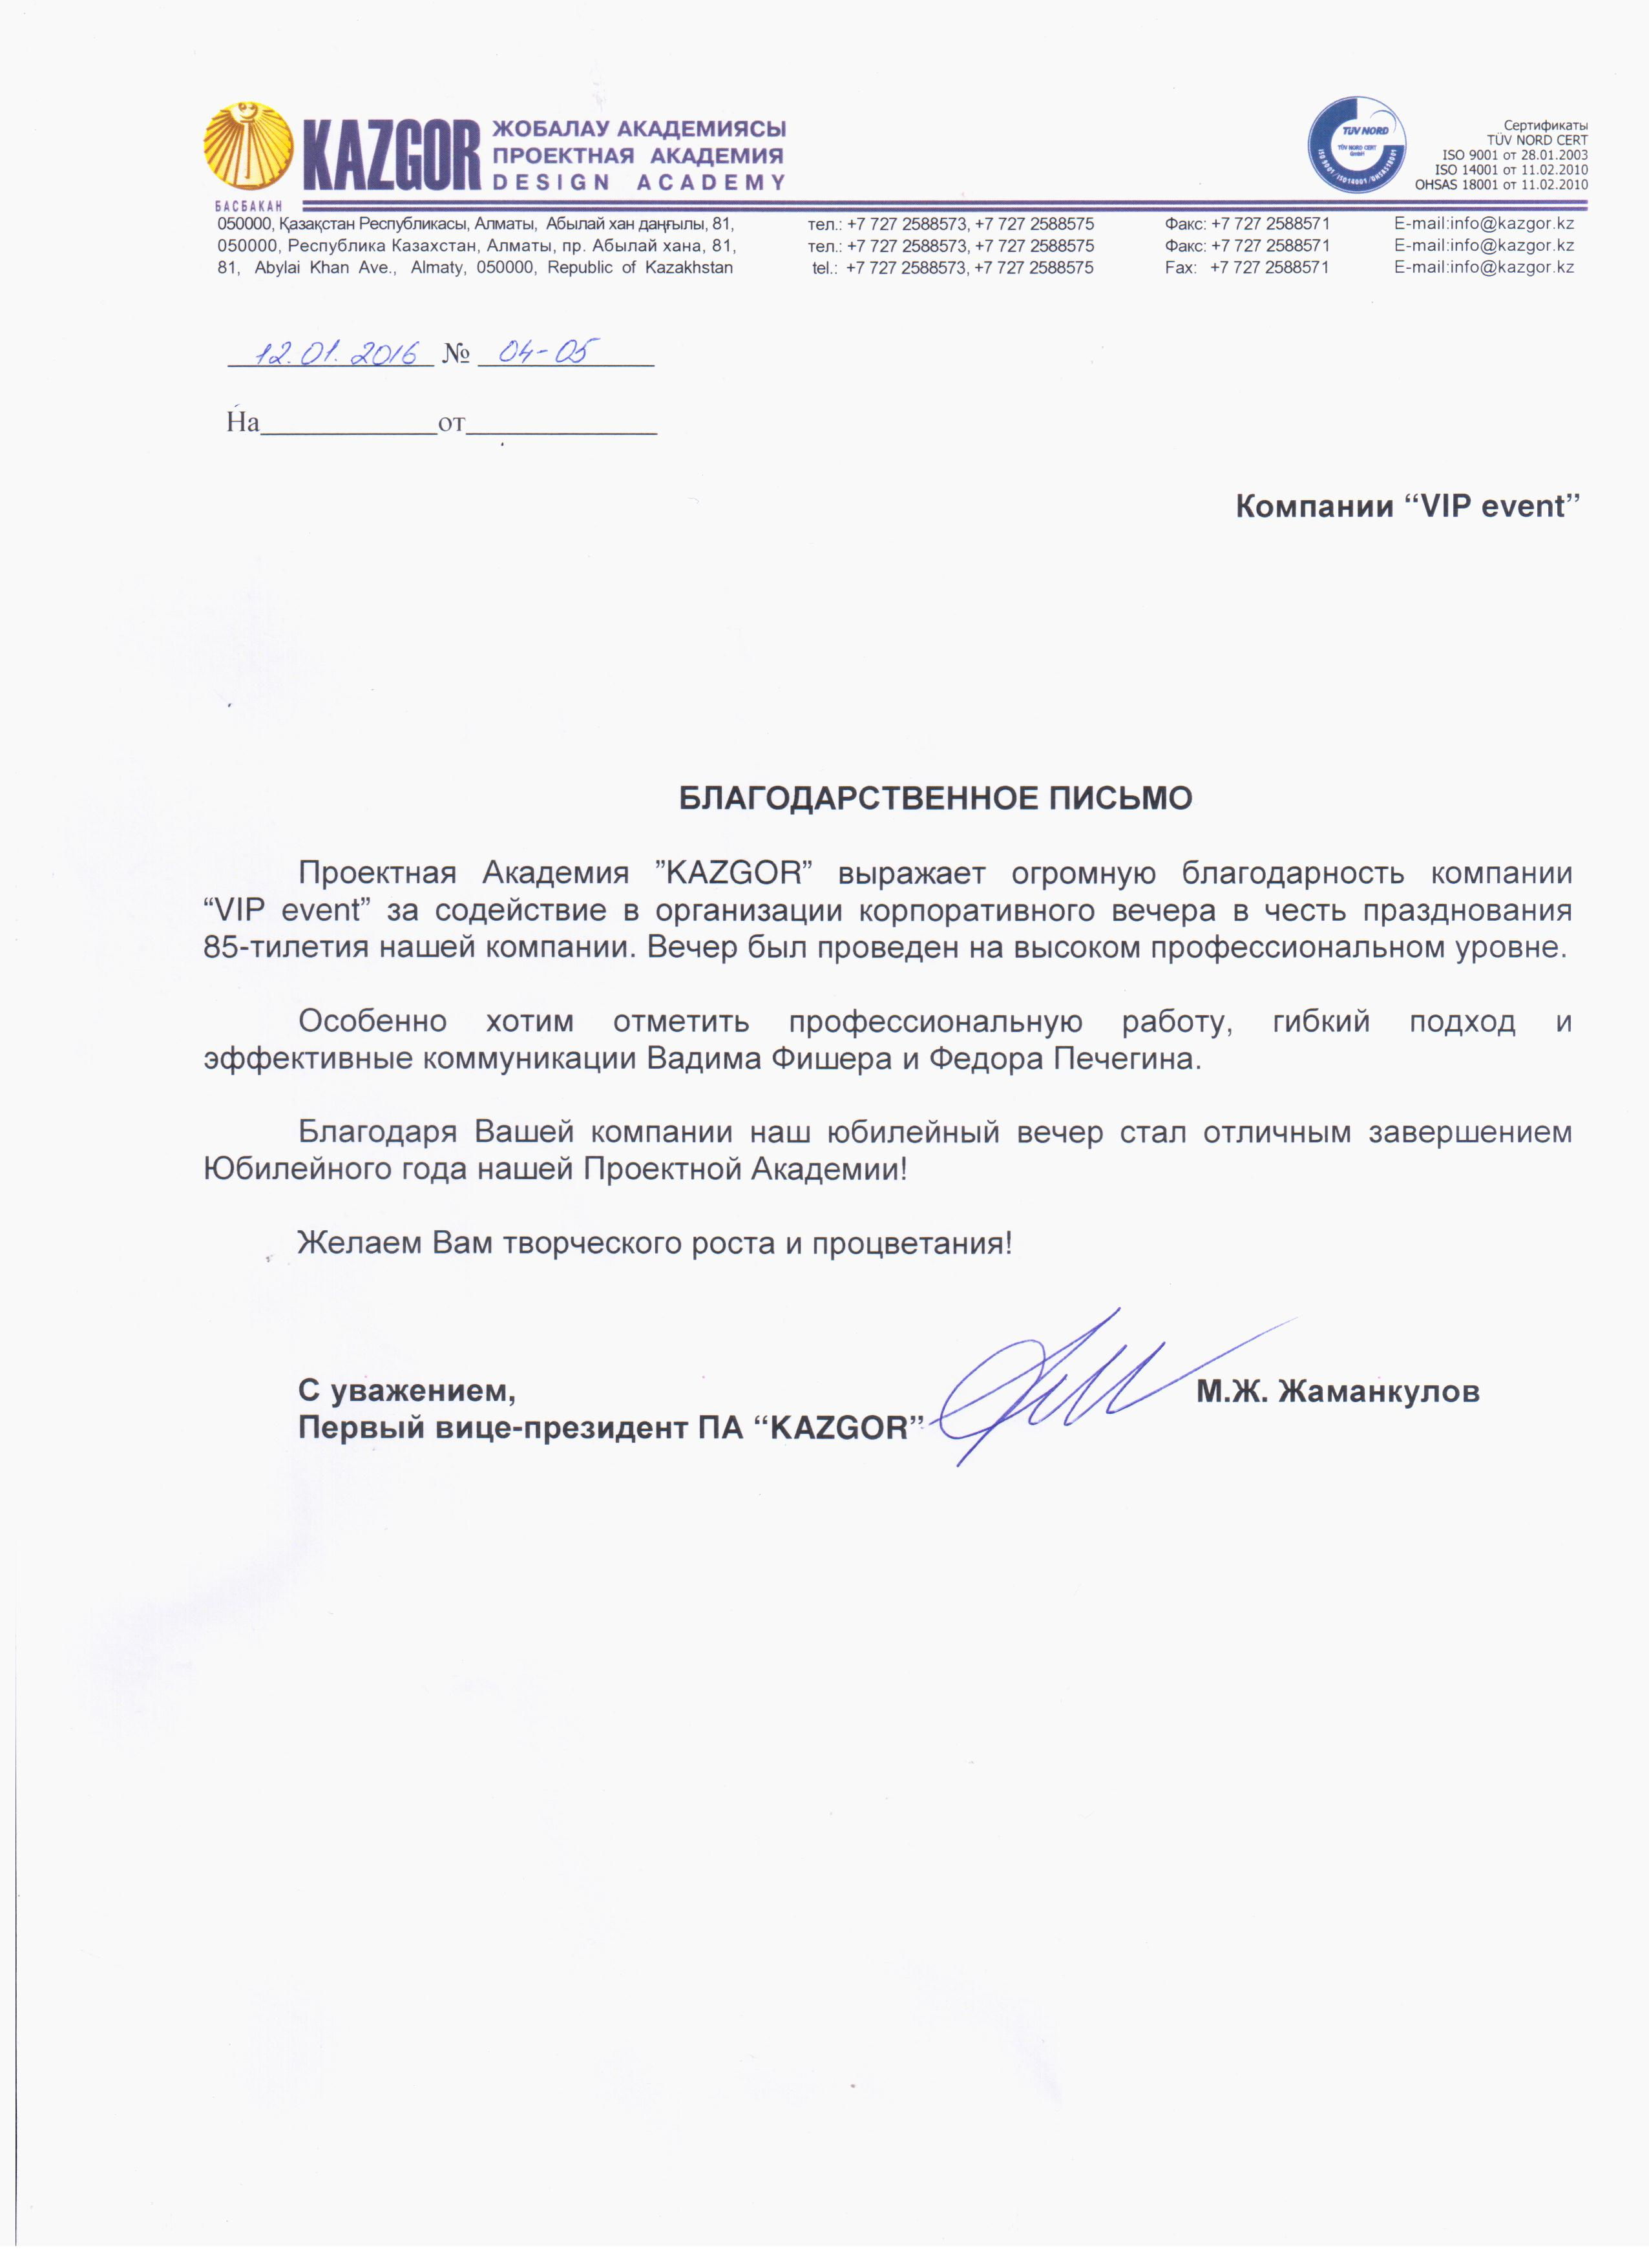 Проектная академия КАЗГОР